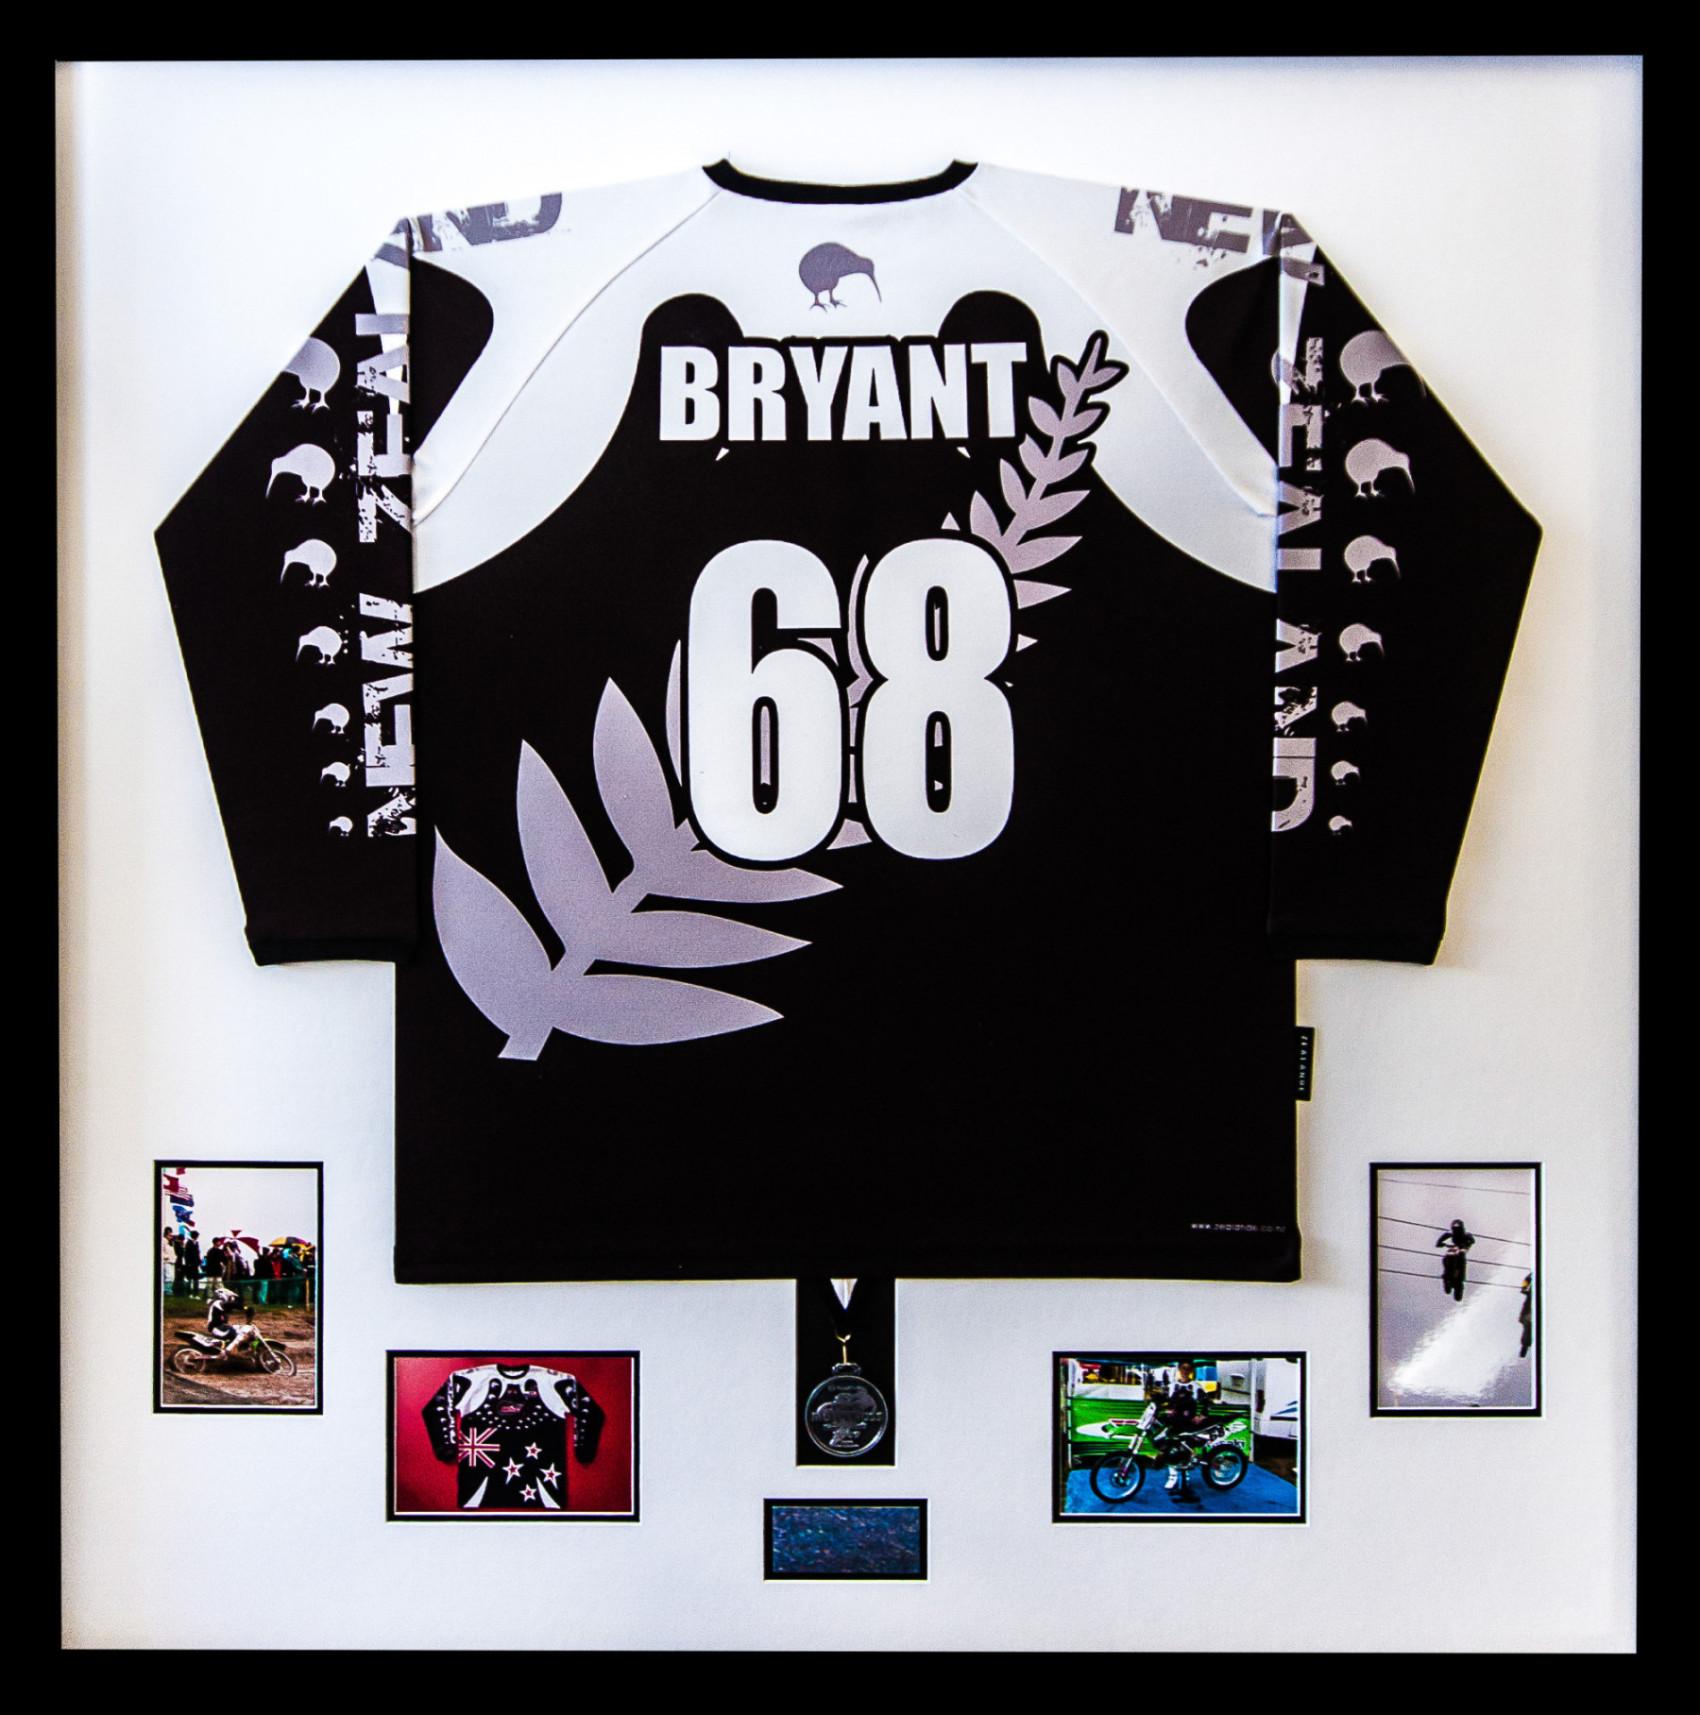 Motocross Jersey & Memorabilia